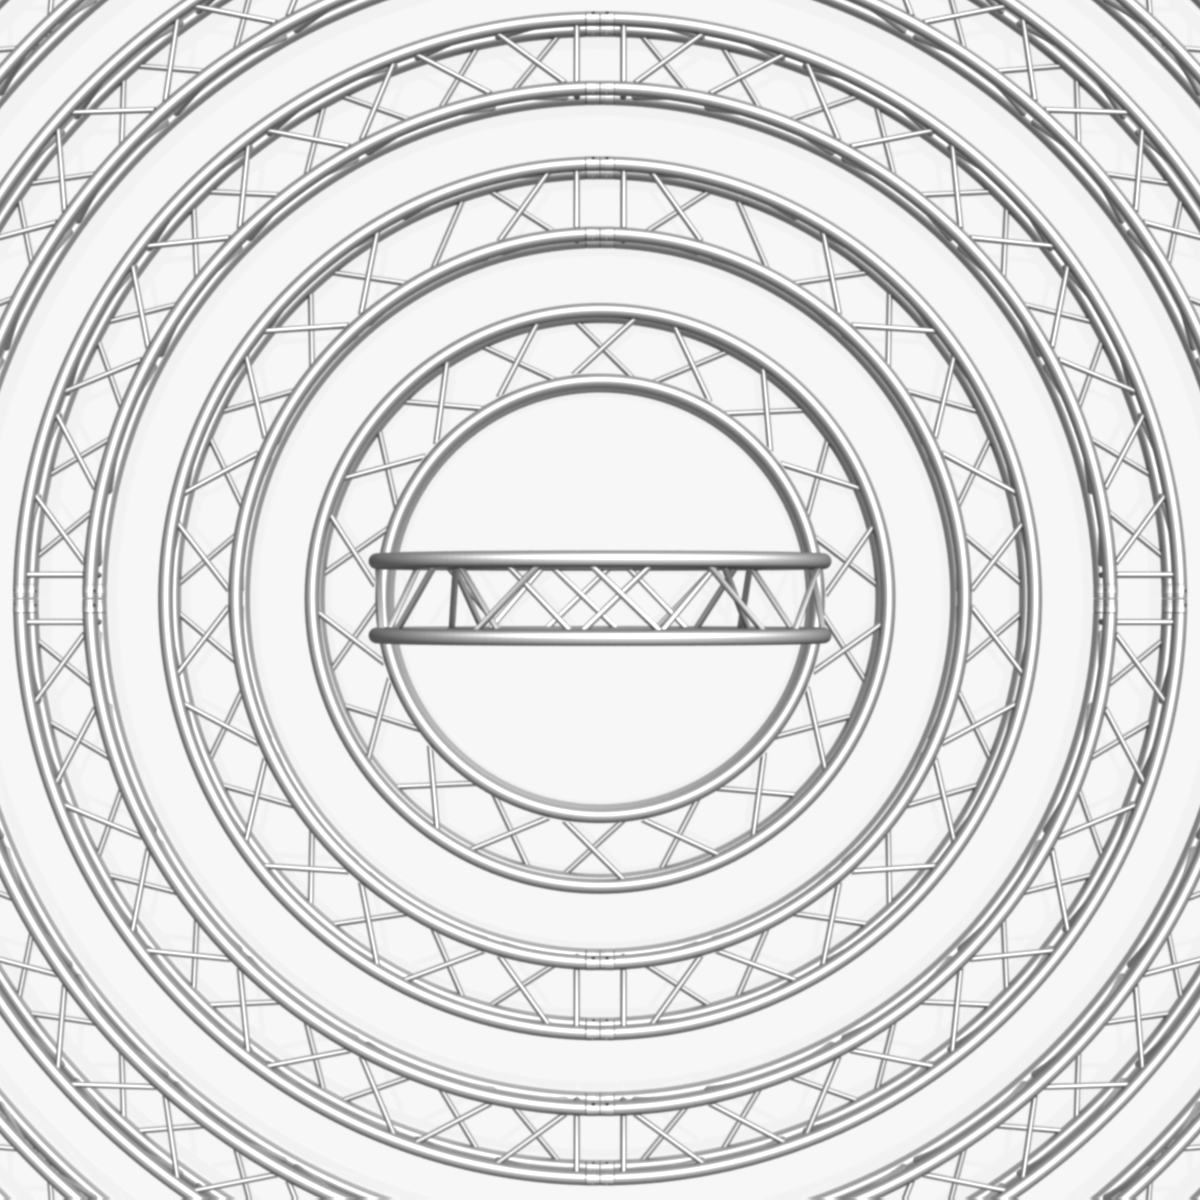 circle square truss modular collection 3d model 3ds max dxf fbx c4d dae  texture obj 252347